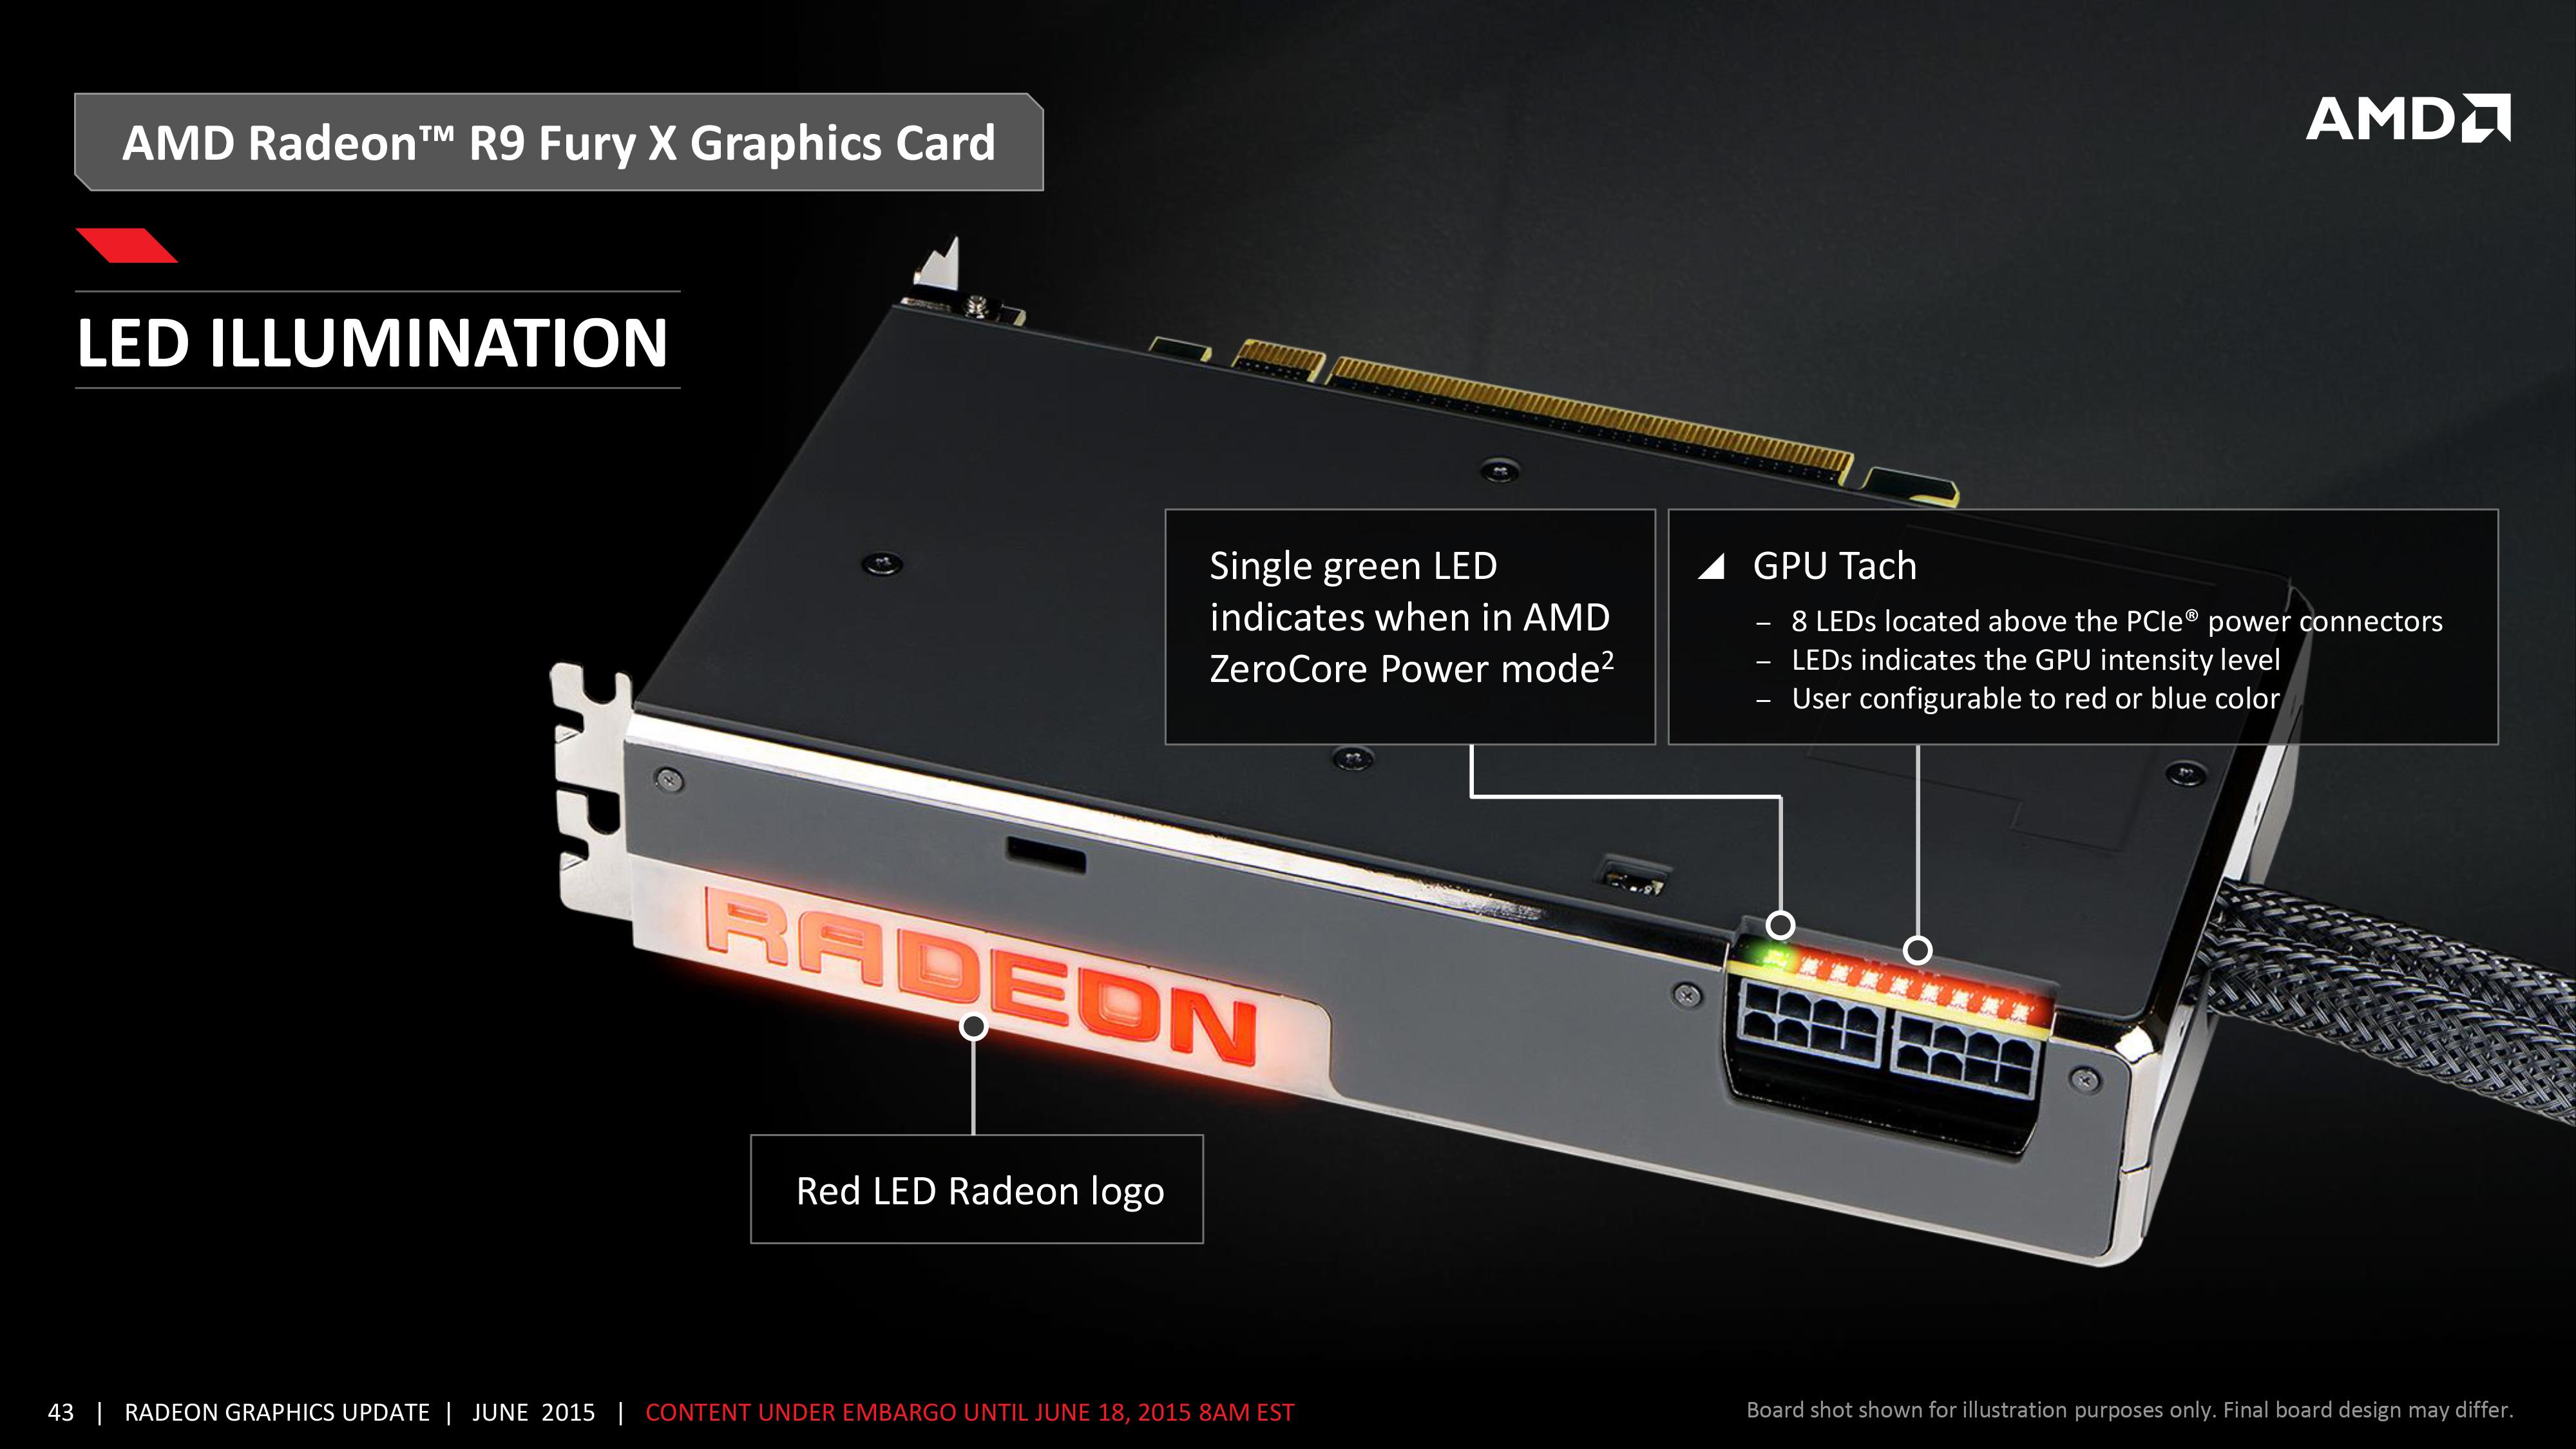 Meet The Radeon R9 Fury X The Amd Radeon R9 Fury X